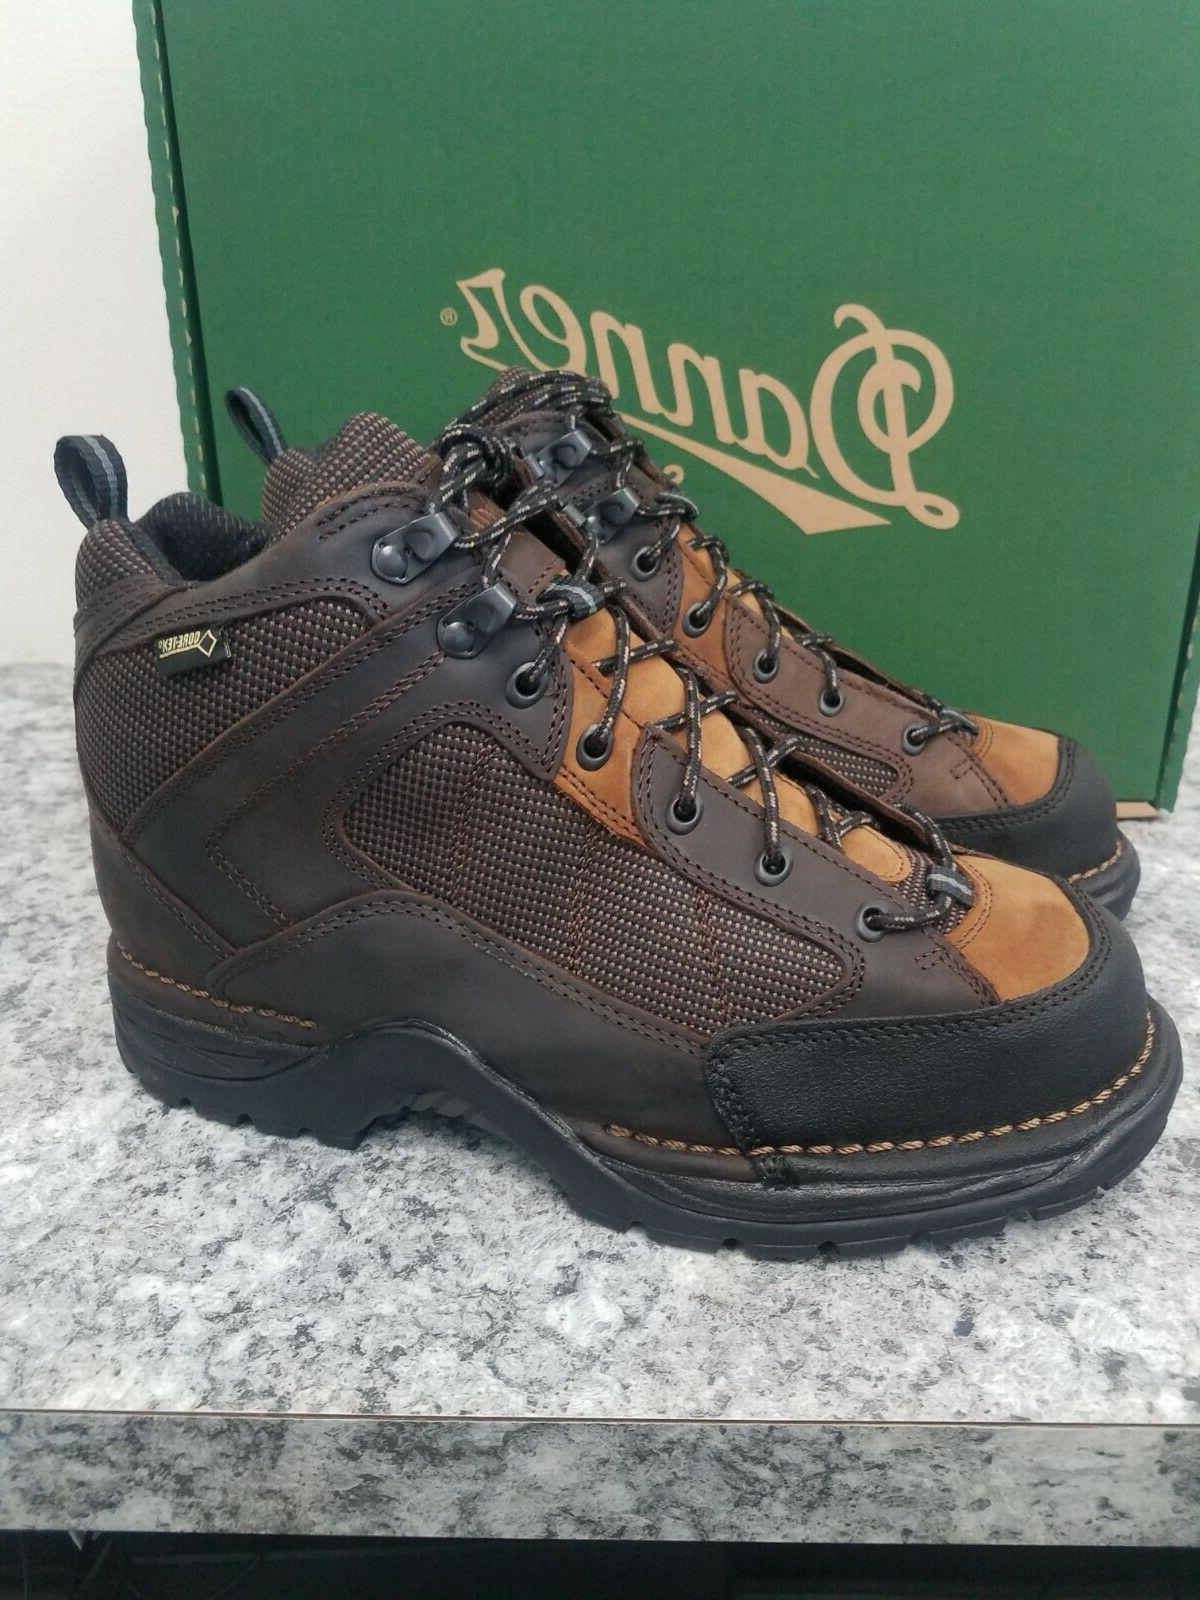 Danner 452 Steel Toe Hiking Boots